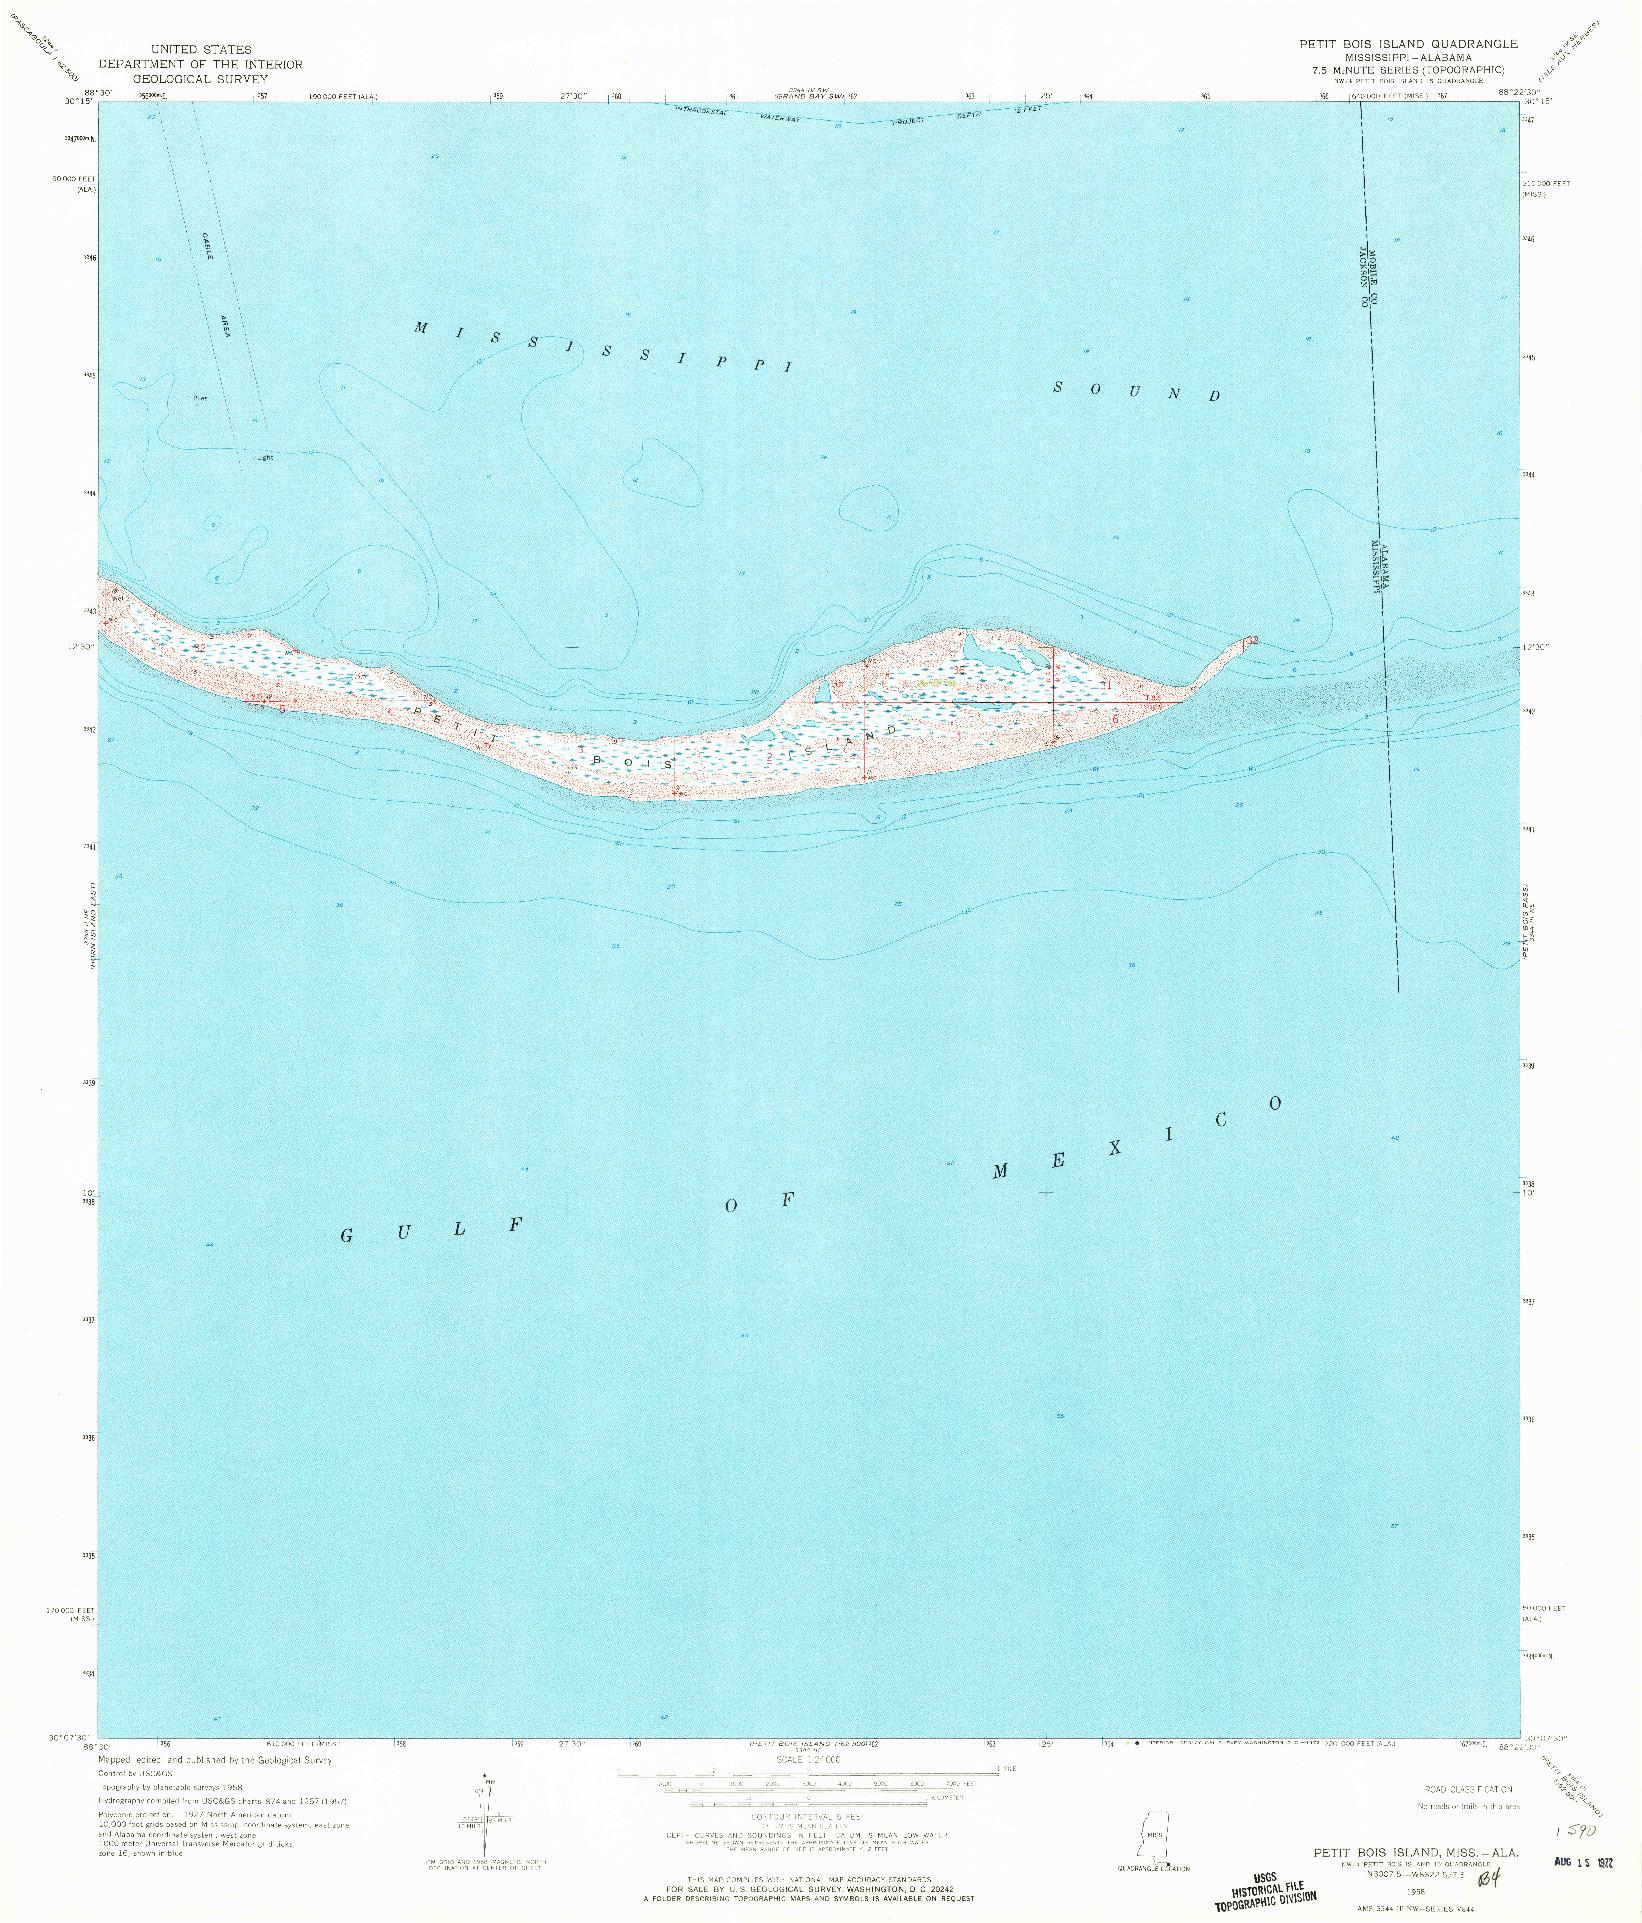 USGS 1:24000-SCALE QUADRANGLE FOR PETIT BOIS ISLAND, MS 1958